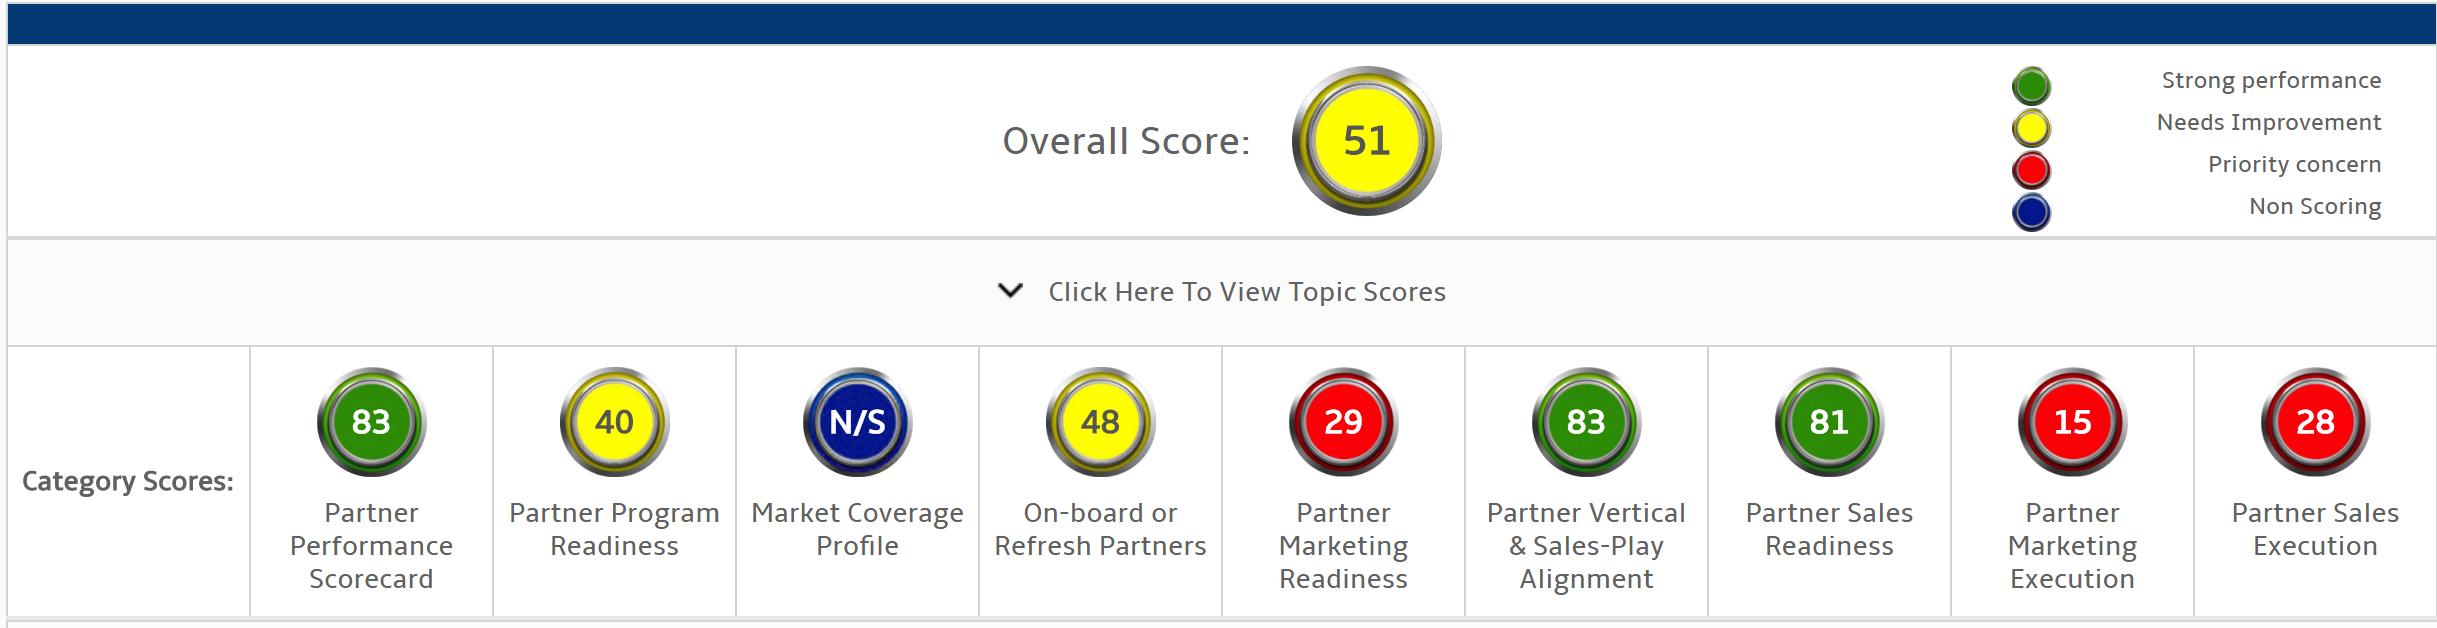 Partner Score